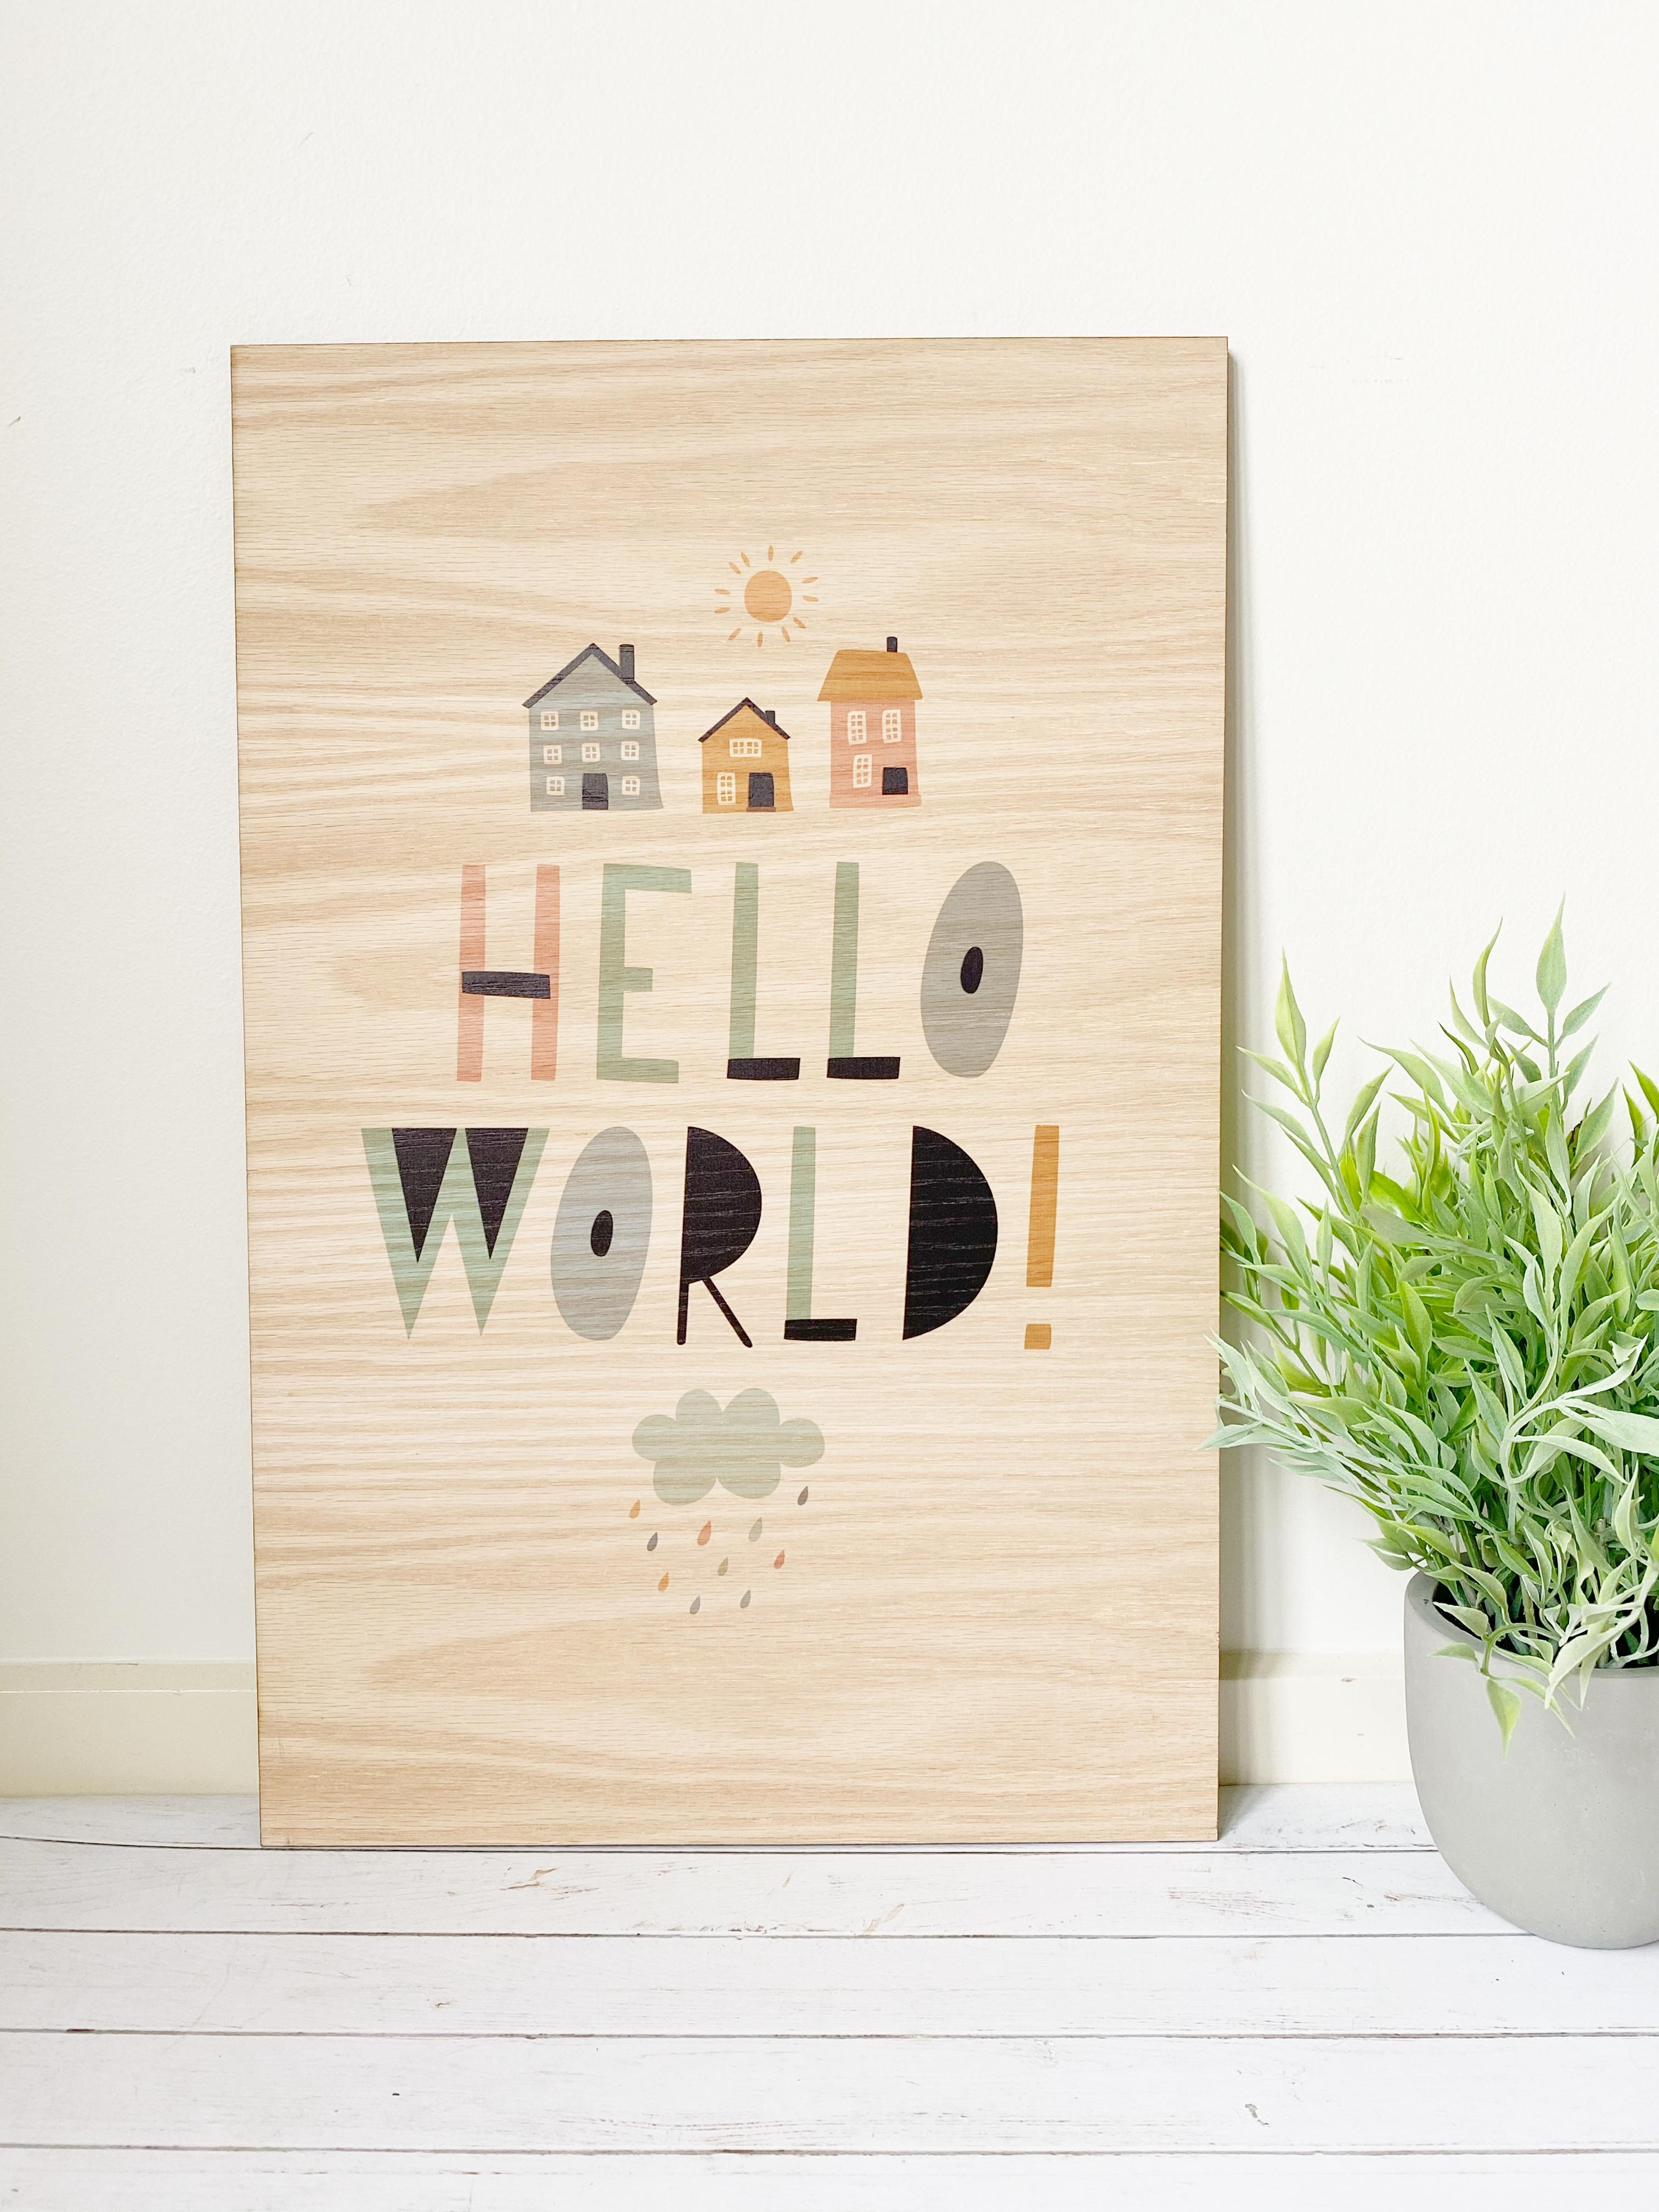 Hello World Wood Wall hanging